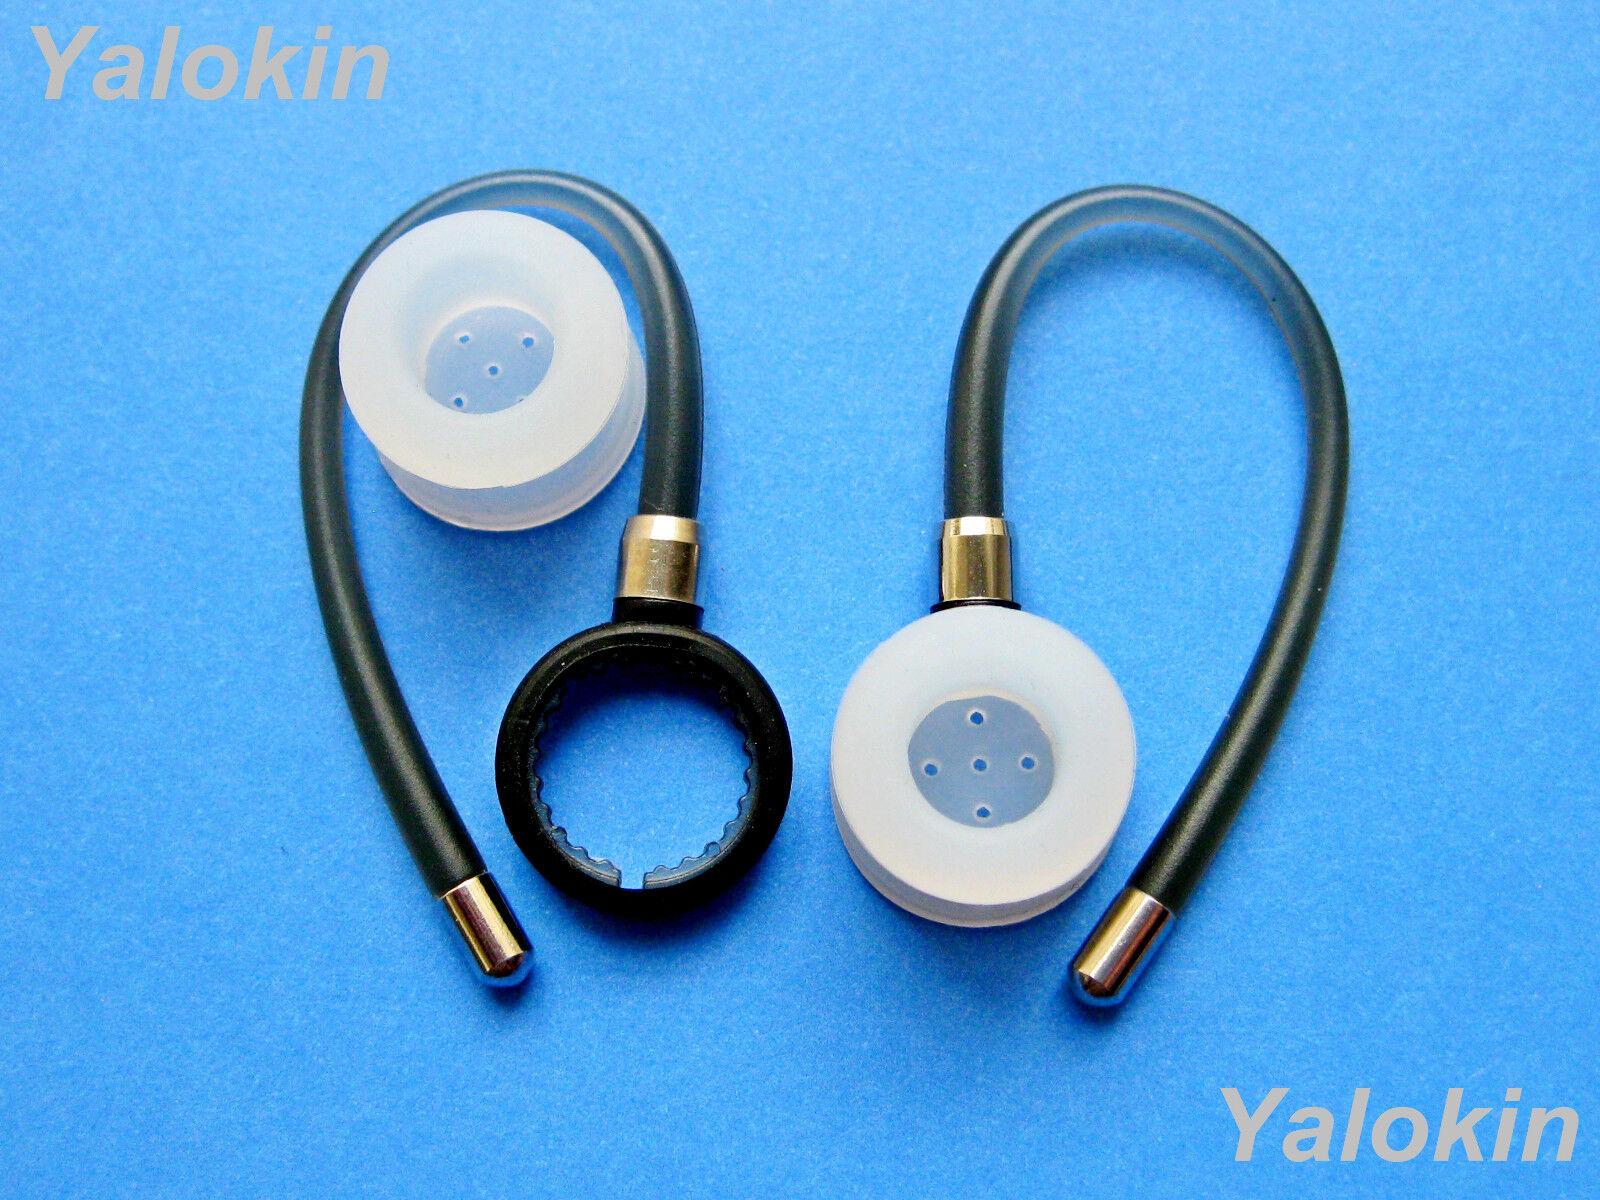 2 Gray Ear-hooks and Earbuds for Motorola HX600 Boom Bluetoo